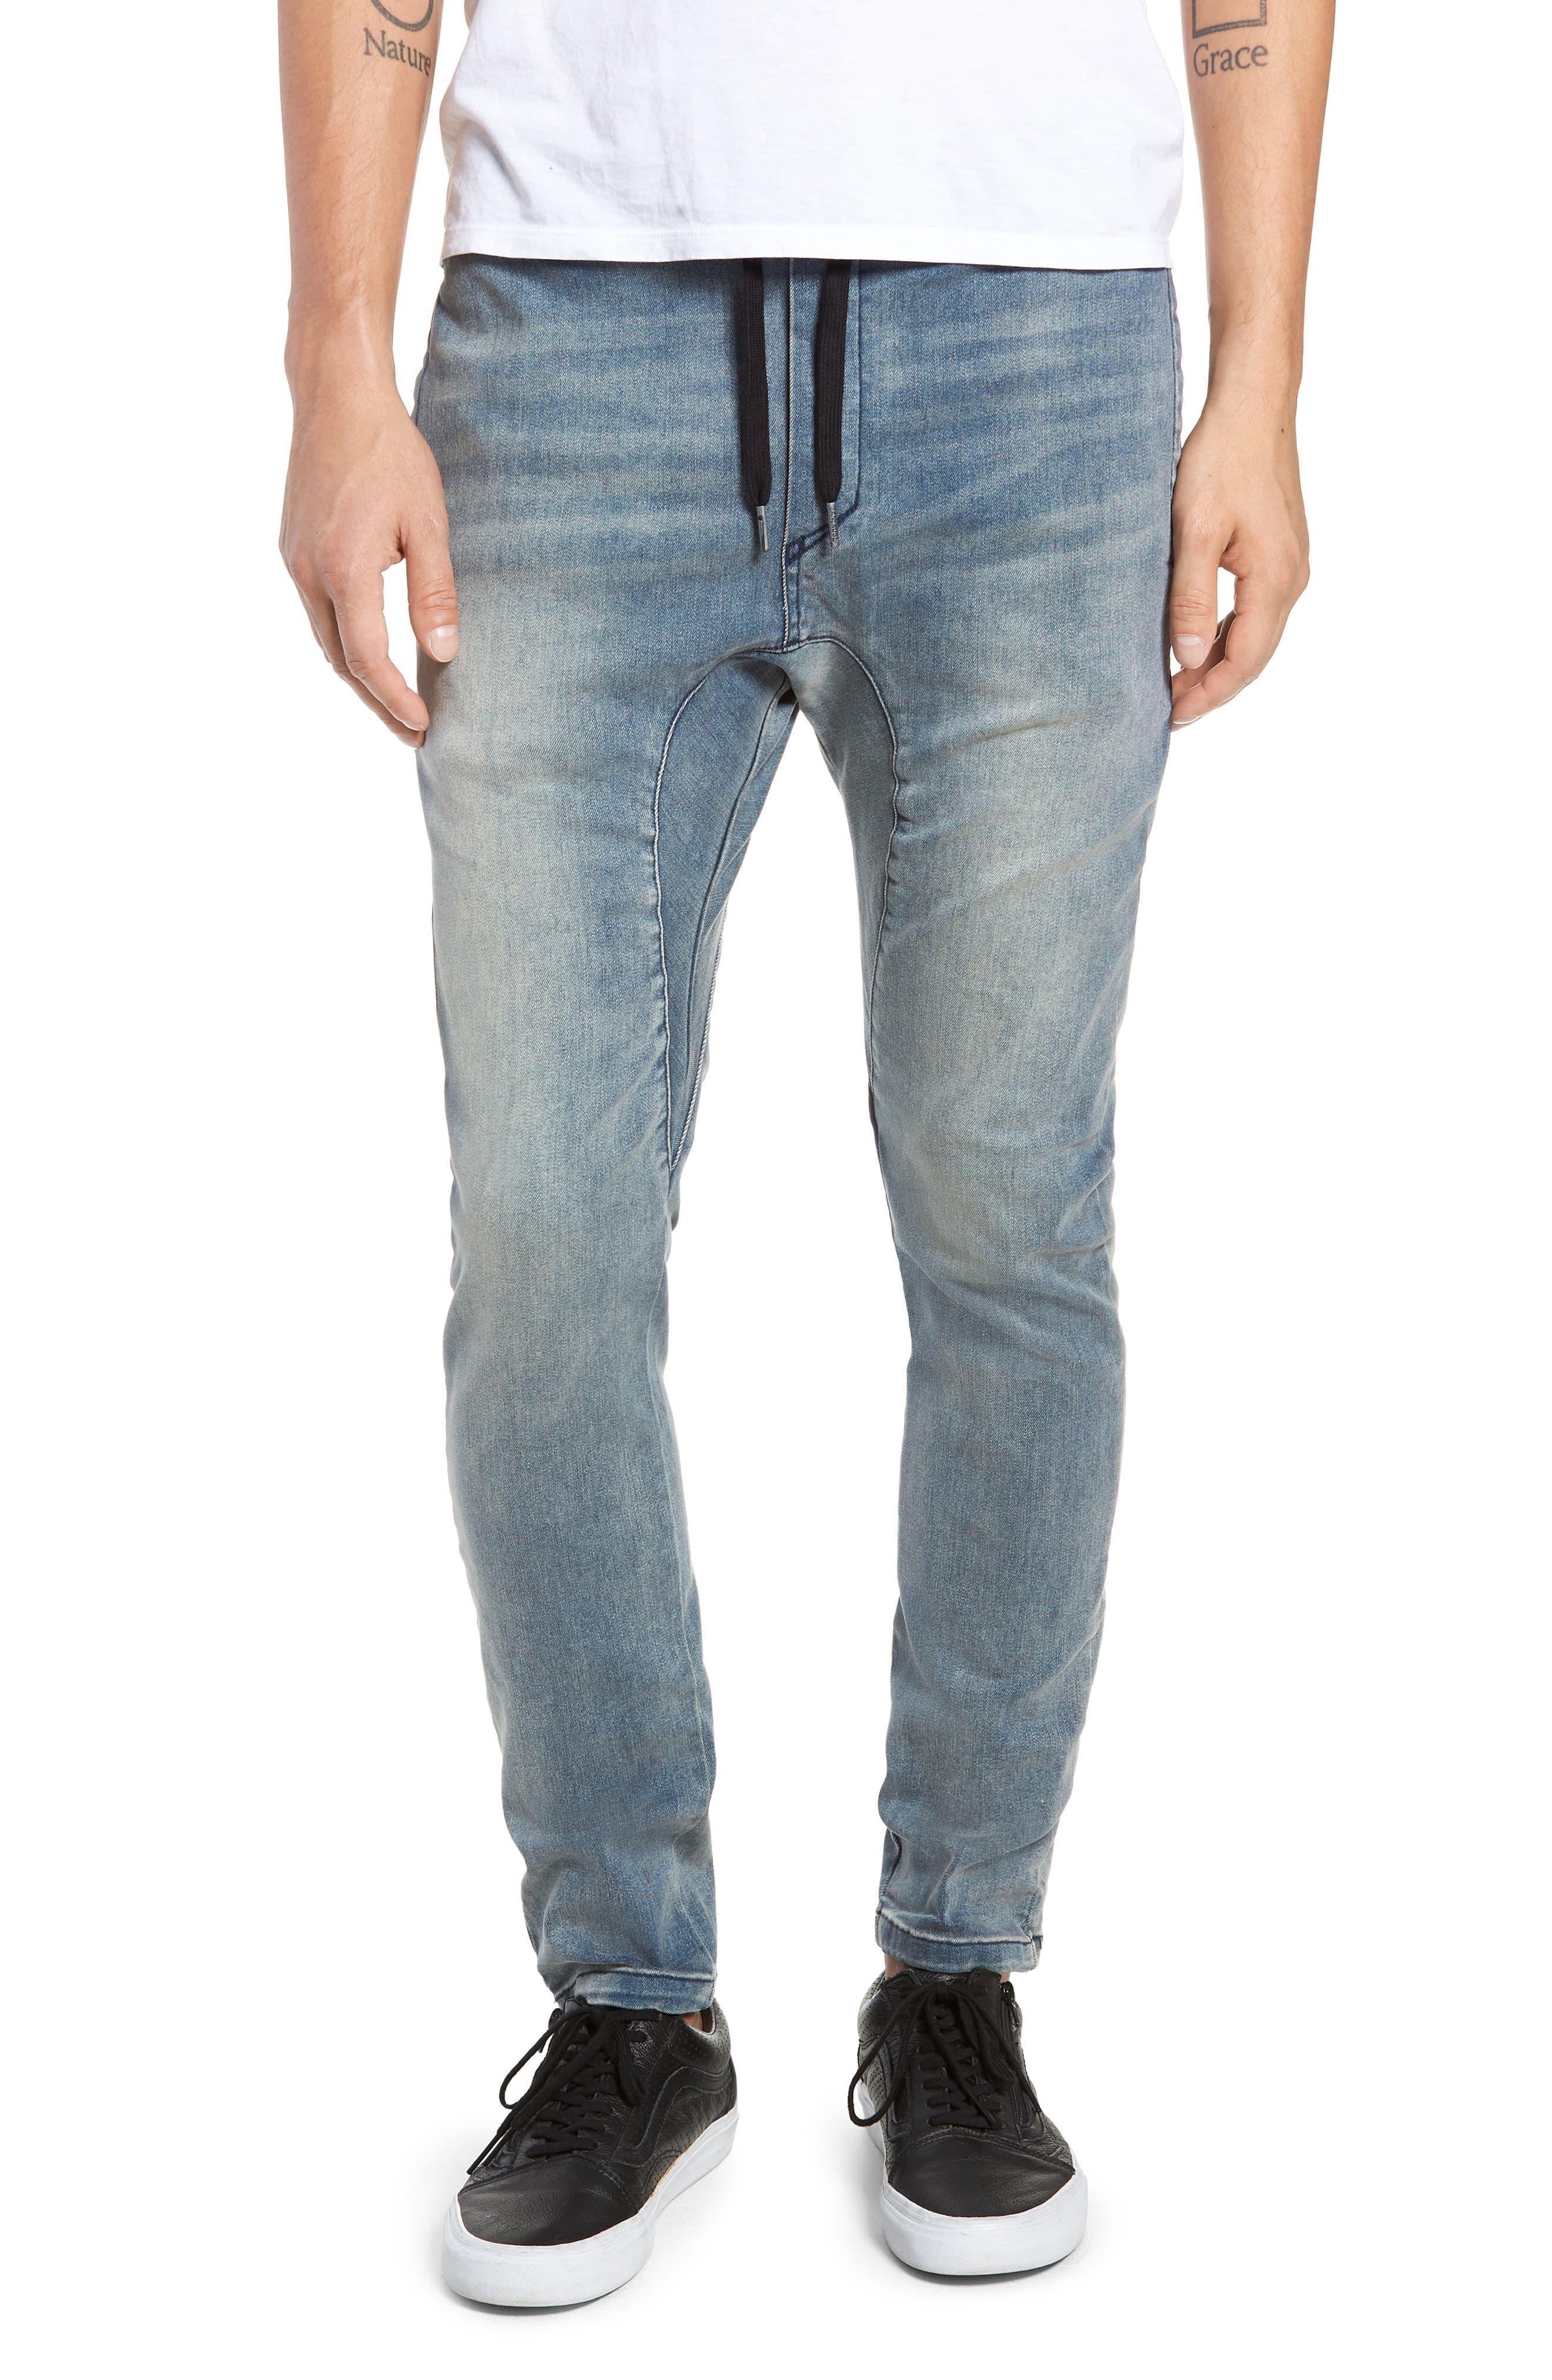 Salerno Flex Jeans,                         Main,                         color, ABANDONED BLUE